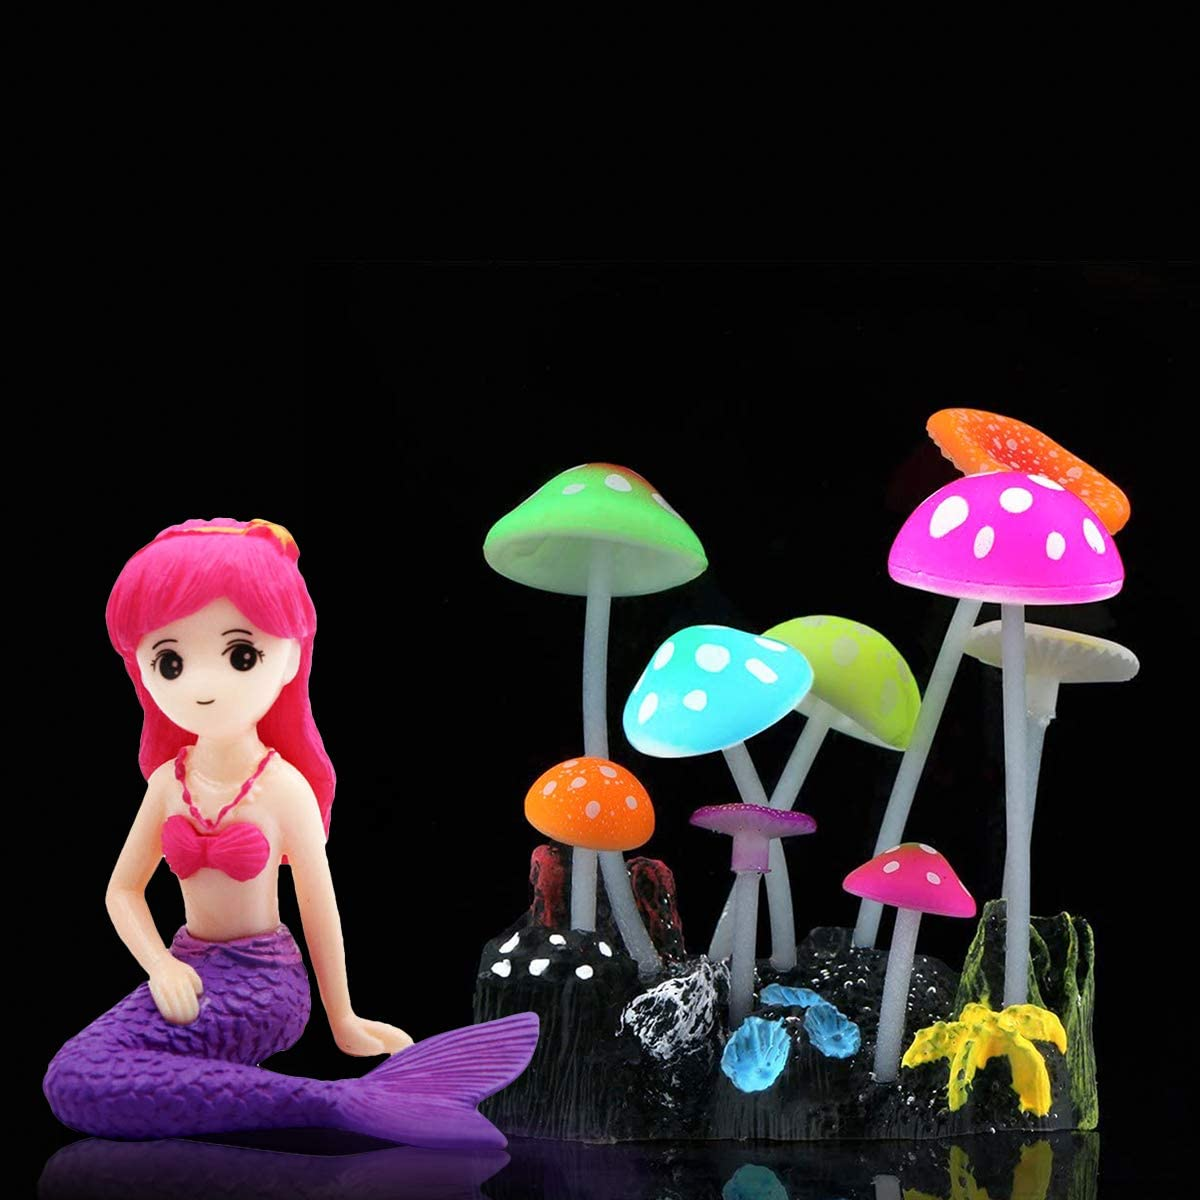 SOLOKA Glowing Effect Artificial Mushroom Aquarium with Mermaid,Plant Decor Ornament Decoration for Fish Tank Landscape,Kids Toys